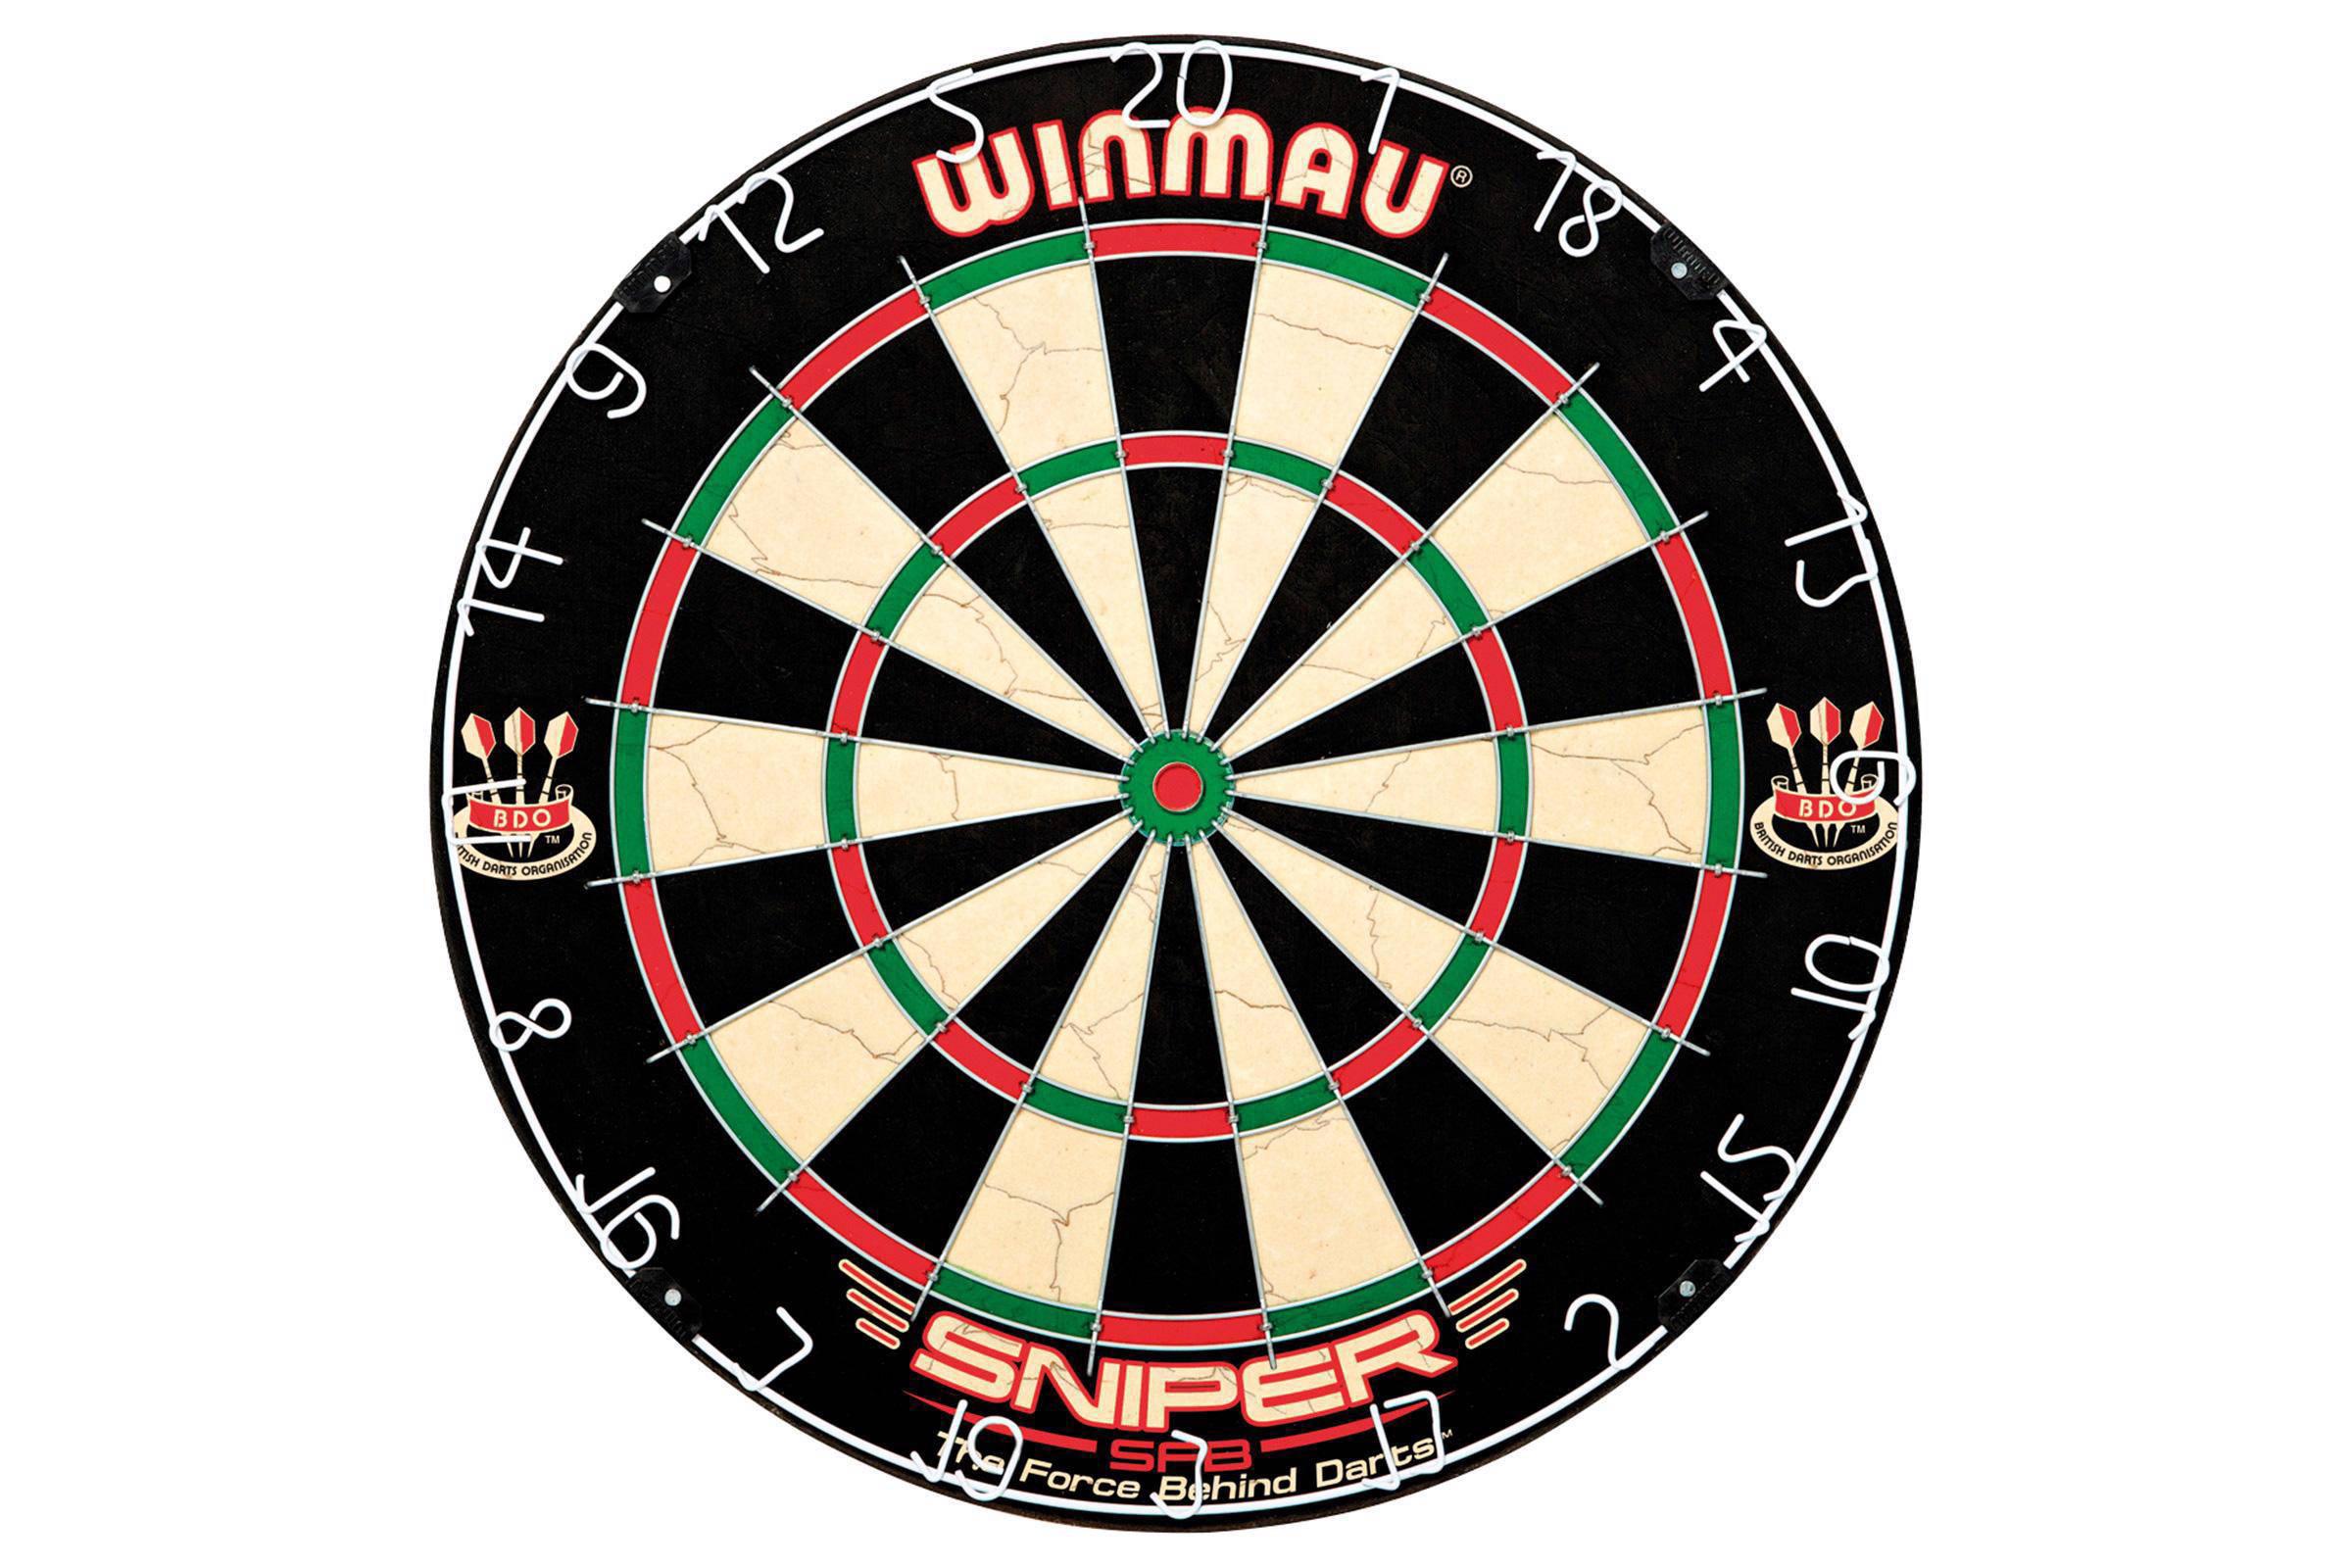 Dartbord In Kast : Winmau sniper dartbord set wehkamp